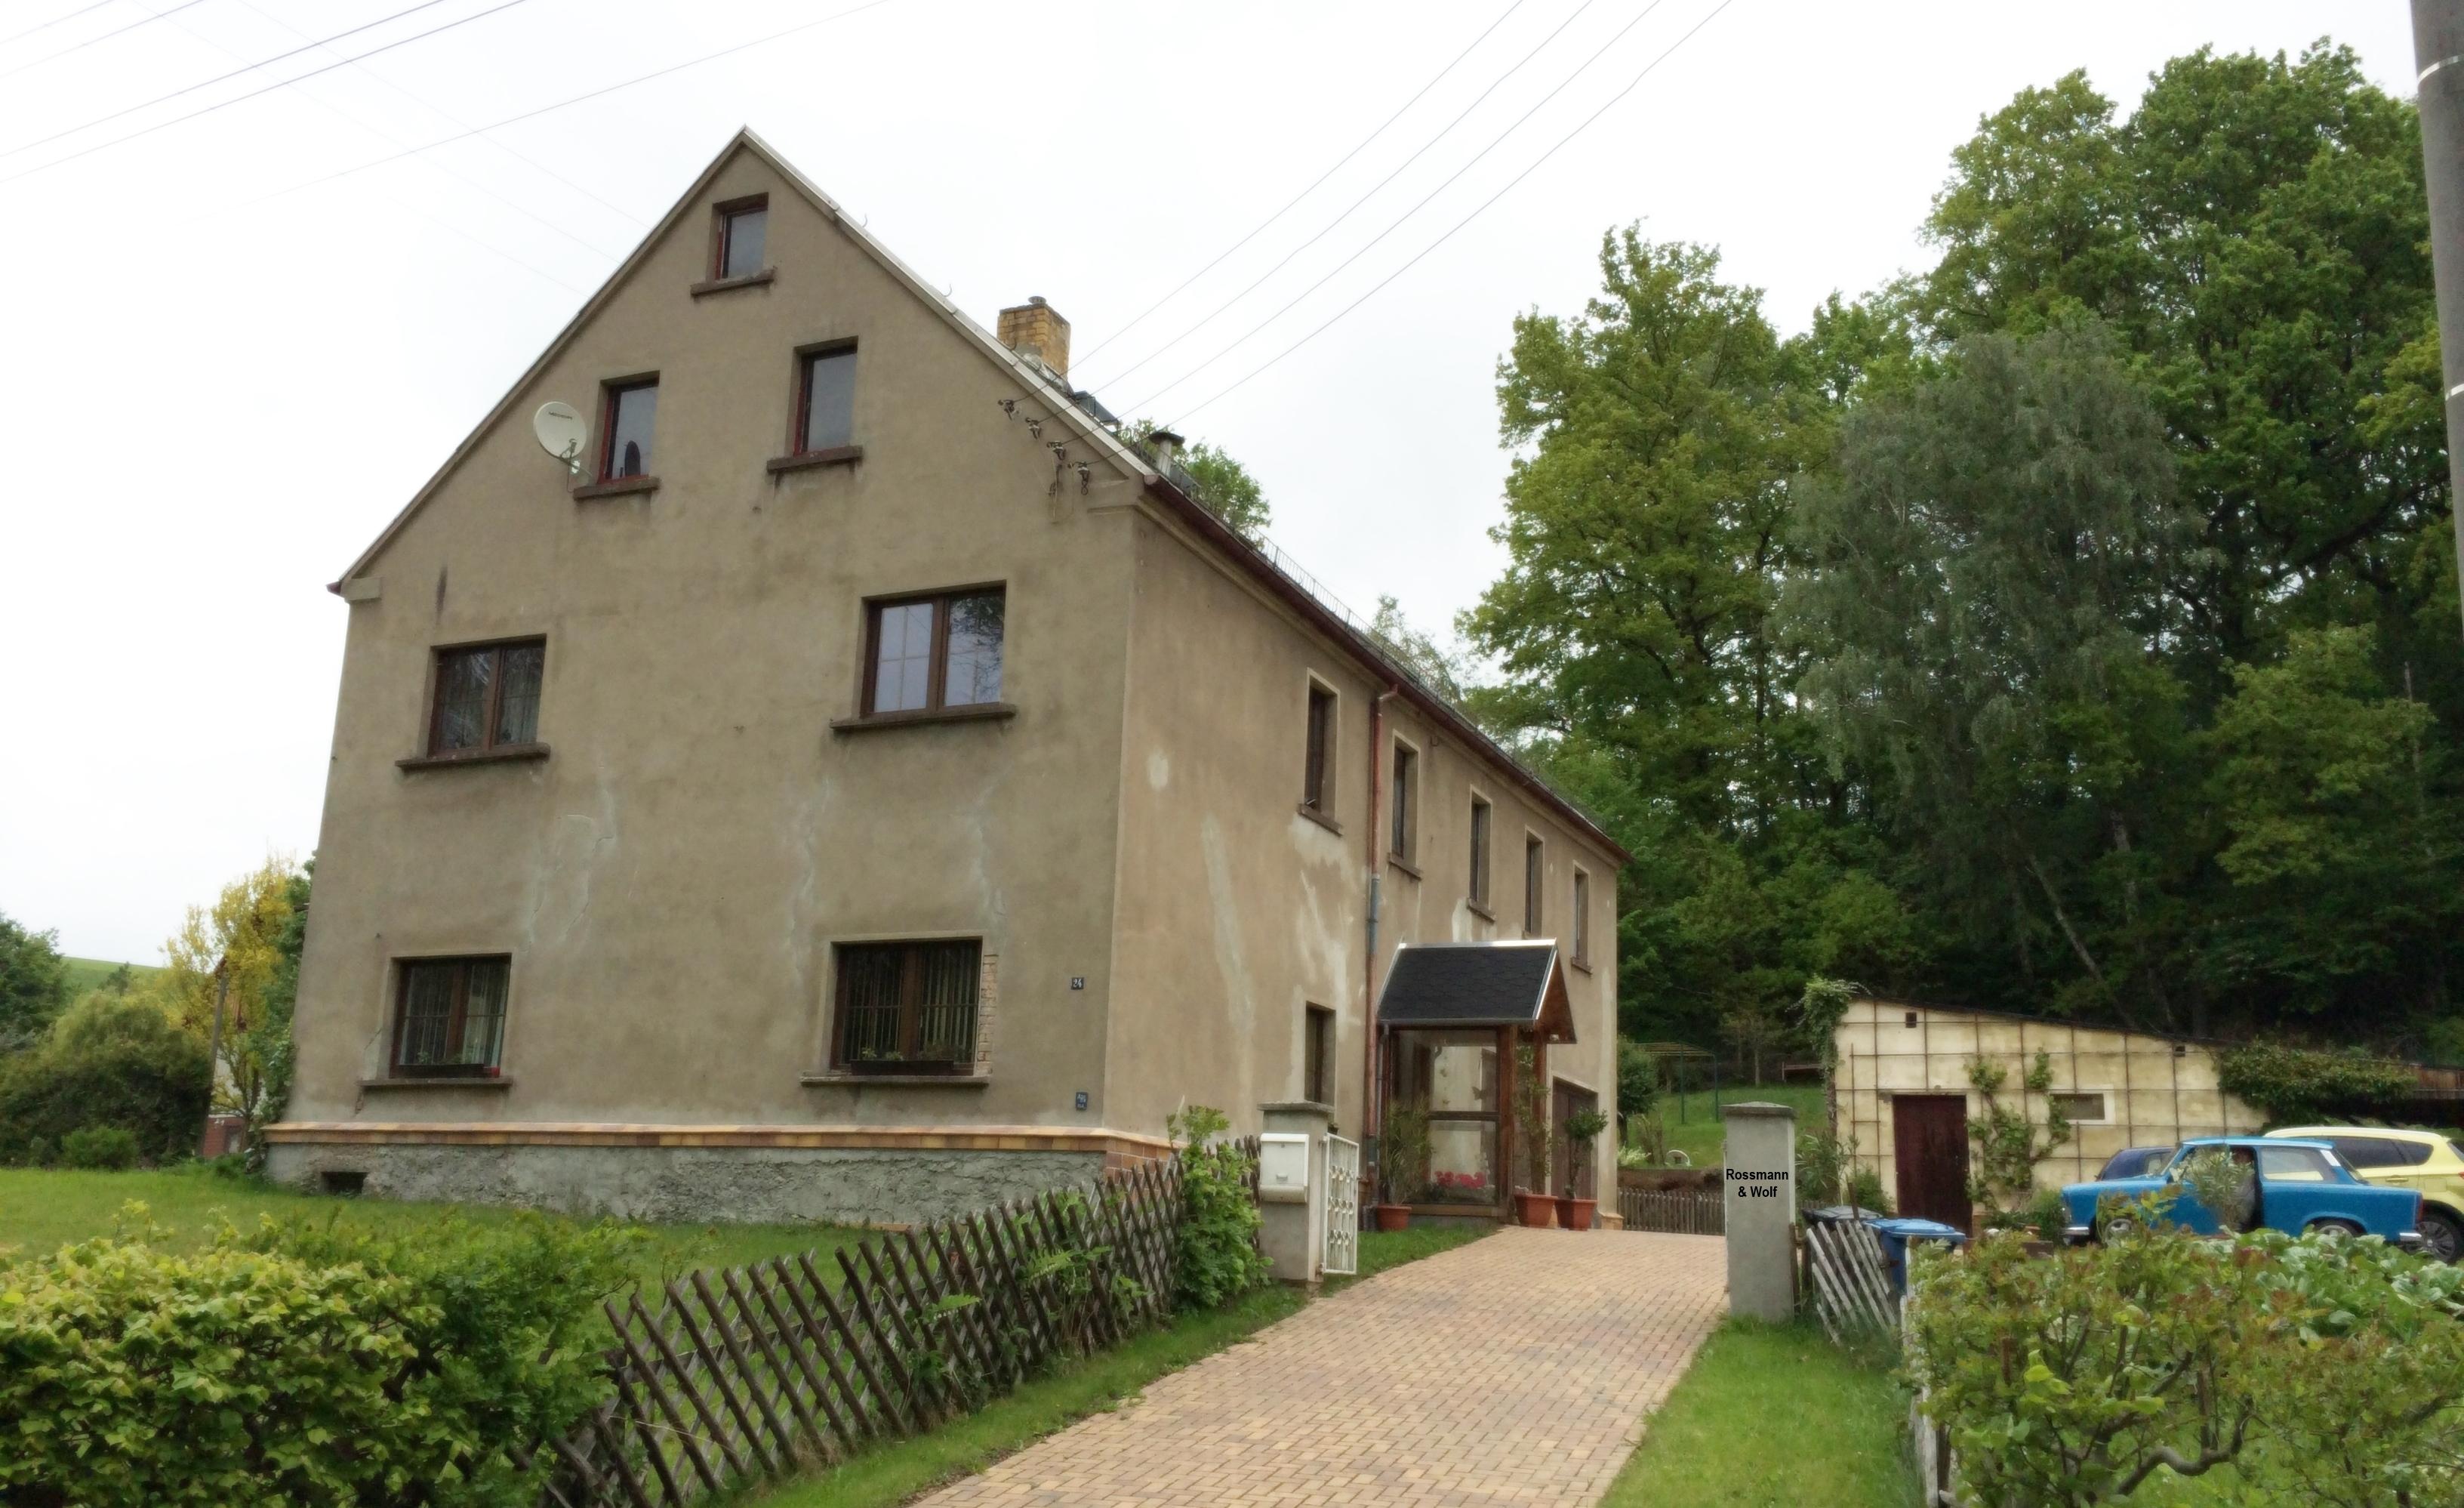 Immobilien Erzgebirge Lugau